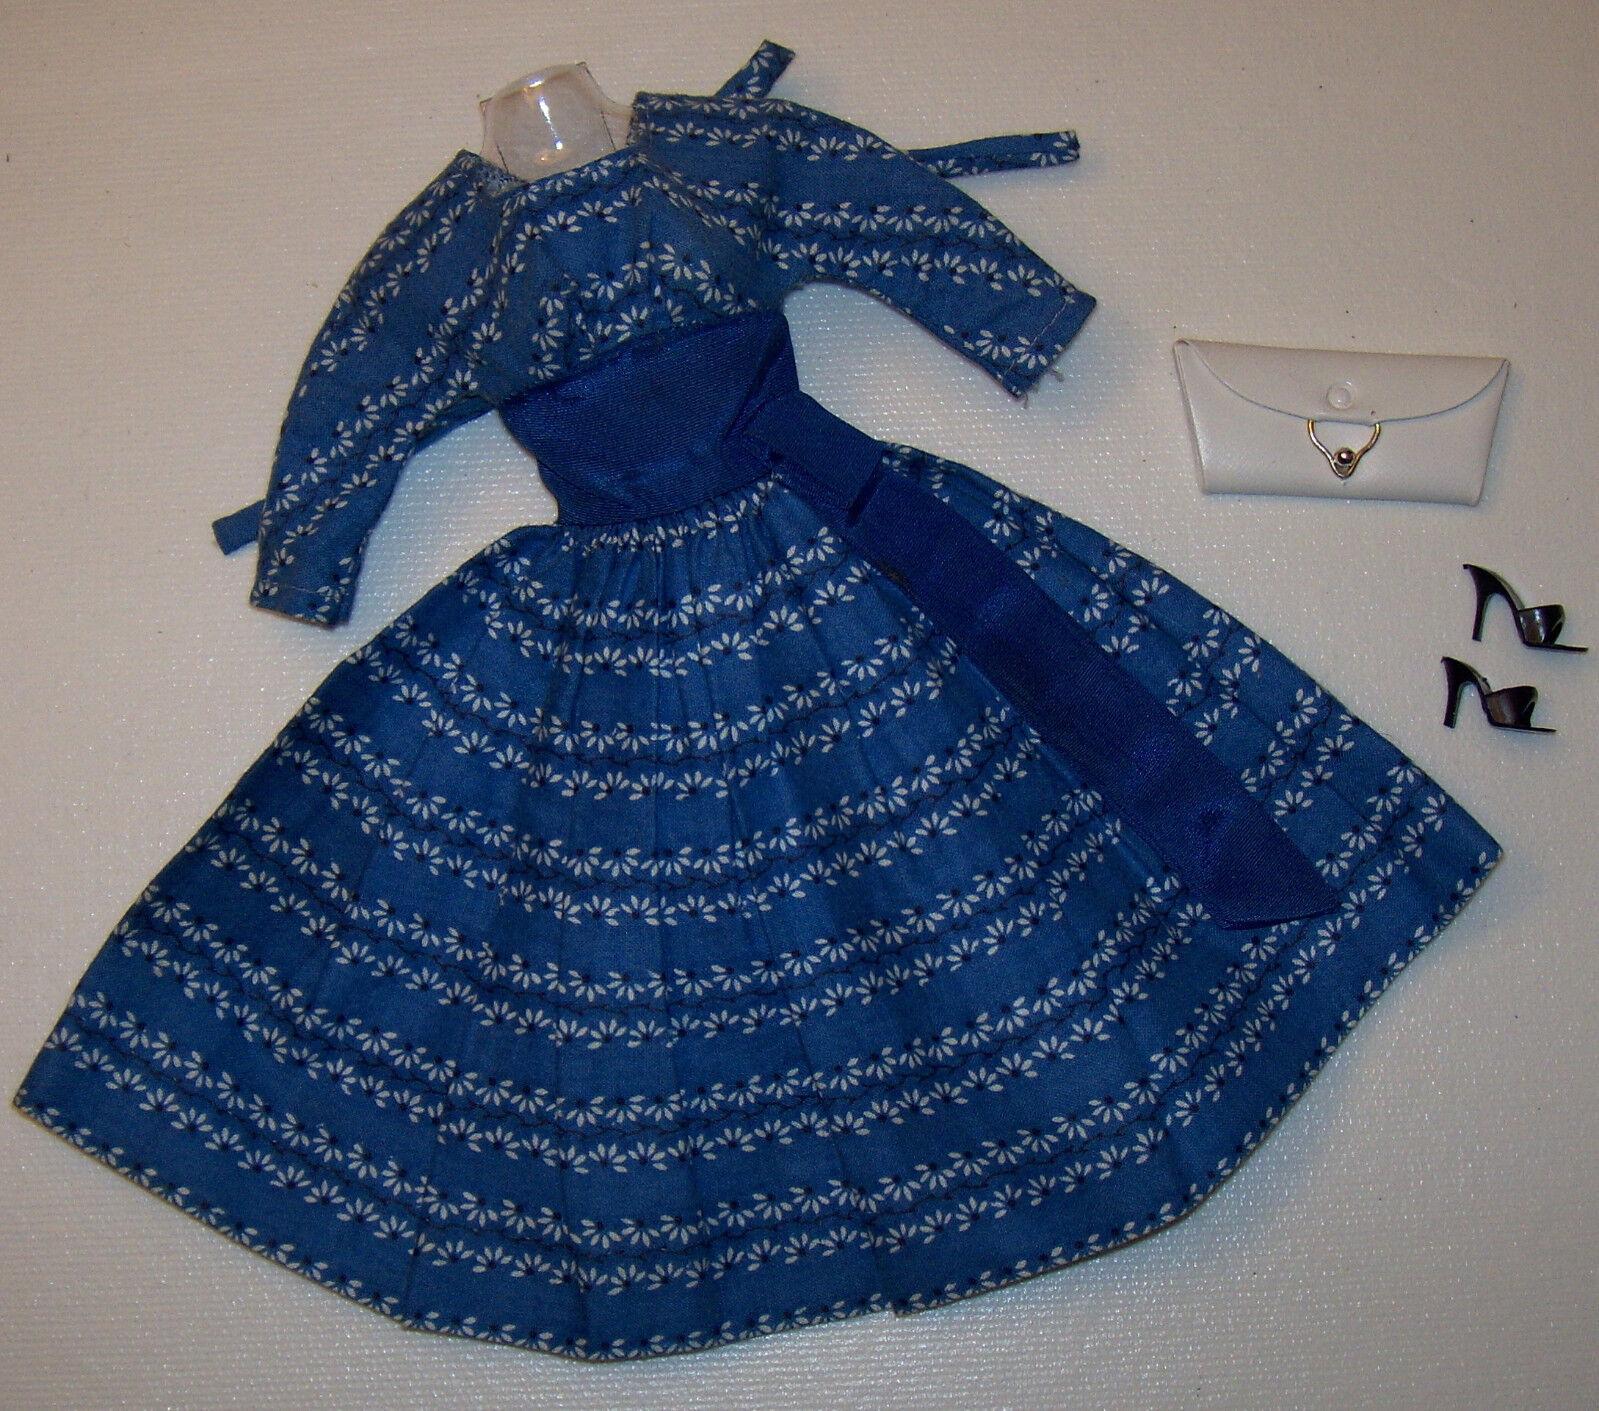 Vintage Barbie Let's Dance Crisp Blaues Kleid  978 & Schwarz Schuhe Weiß